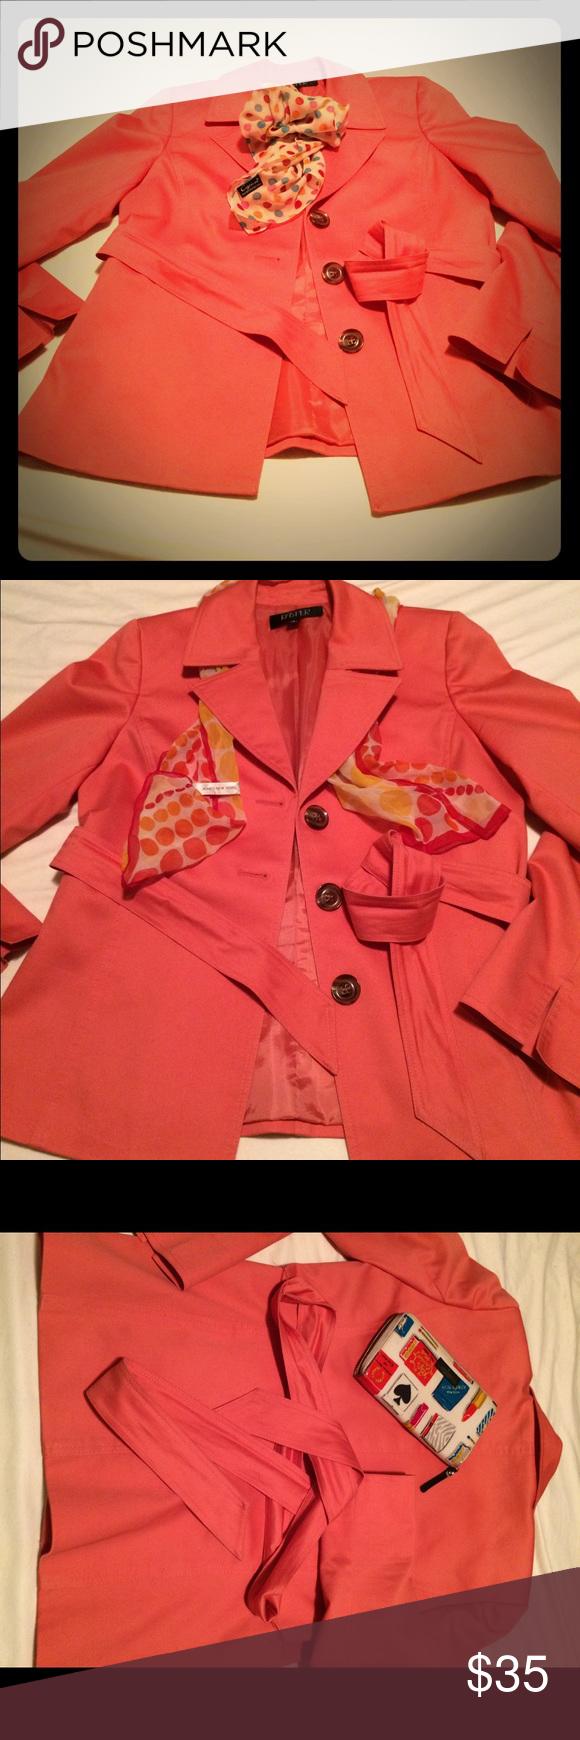 Kasper Peach Peacoat w Belt & Buttons. Barely used. Peach Kasper Peacoat with single breast buttons, belt and pockets. Light weight-fall/spring coat. Cotton / polyester blend. Kasper Jackets & Coats Pea Coats